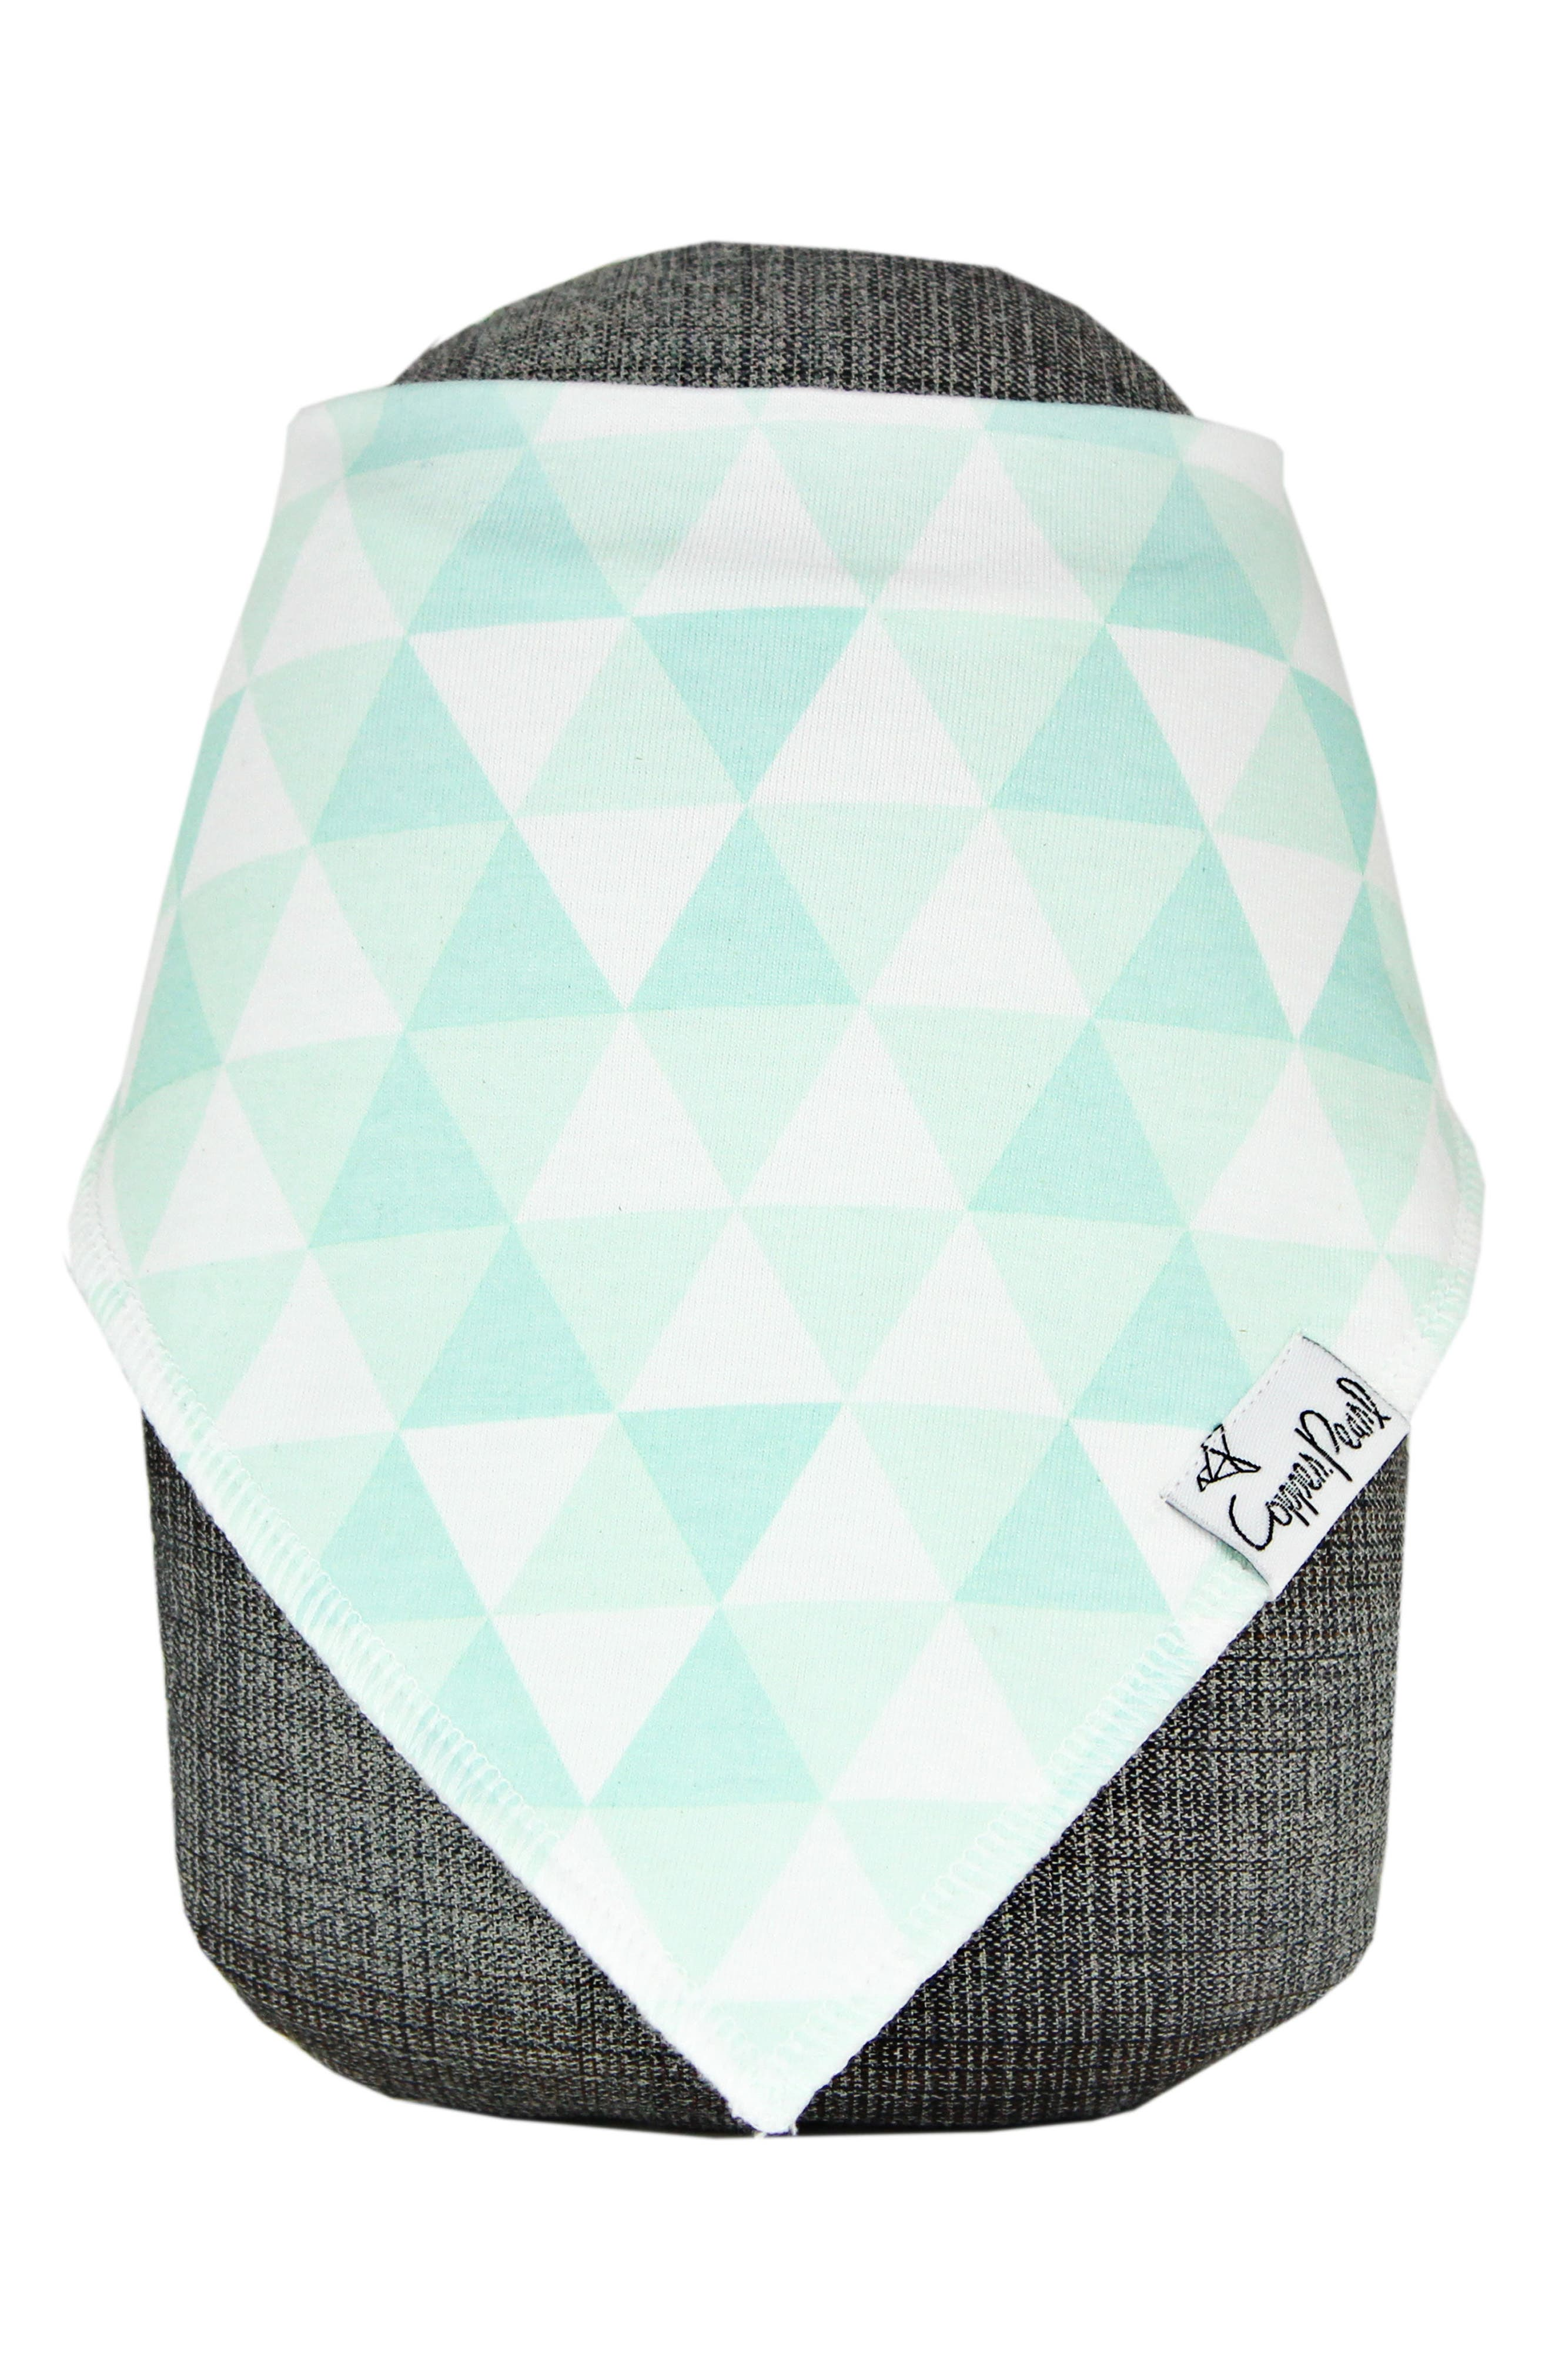 Summit Bib, Multiuse Cover & Swaddle Blanket Gift Set,                             Alternate thumbnail 55, color,                             Summit